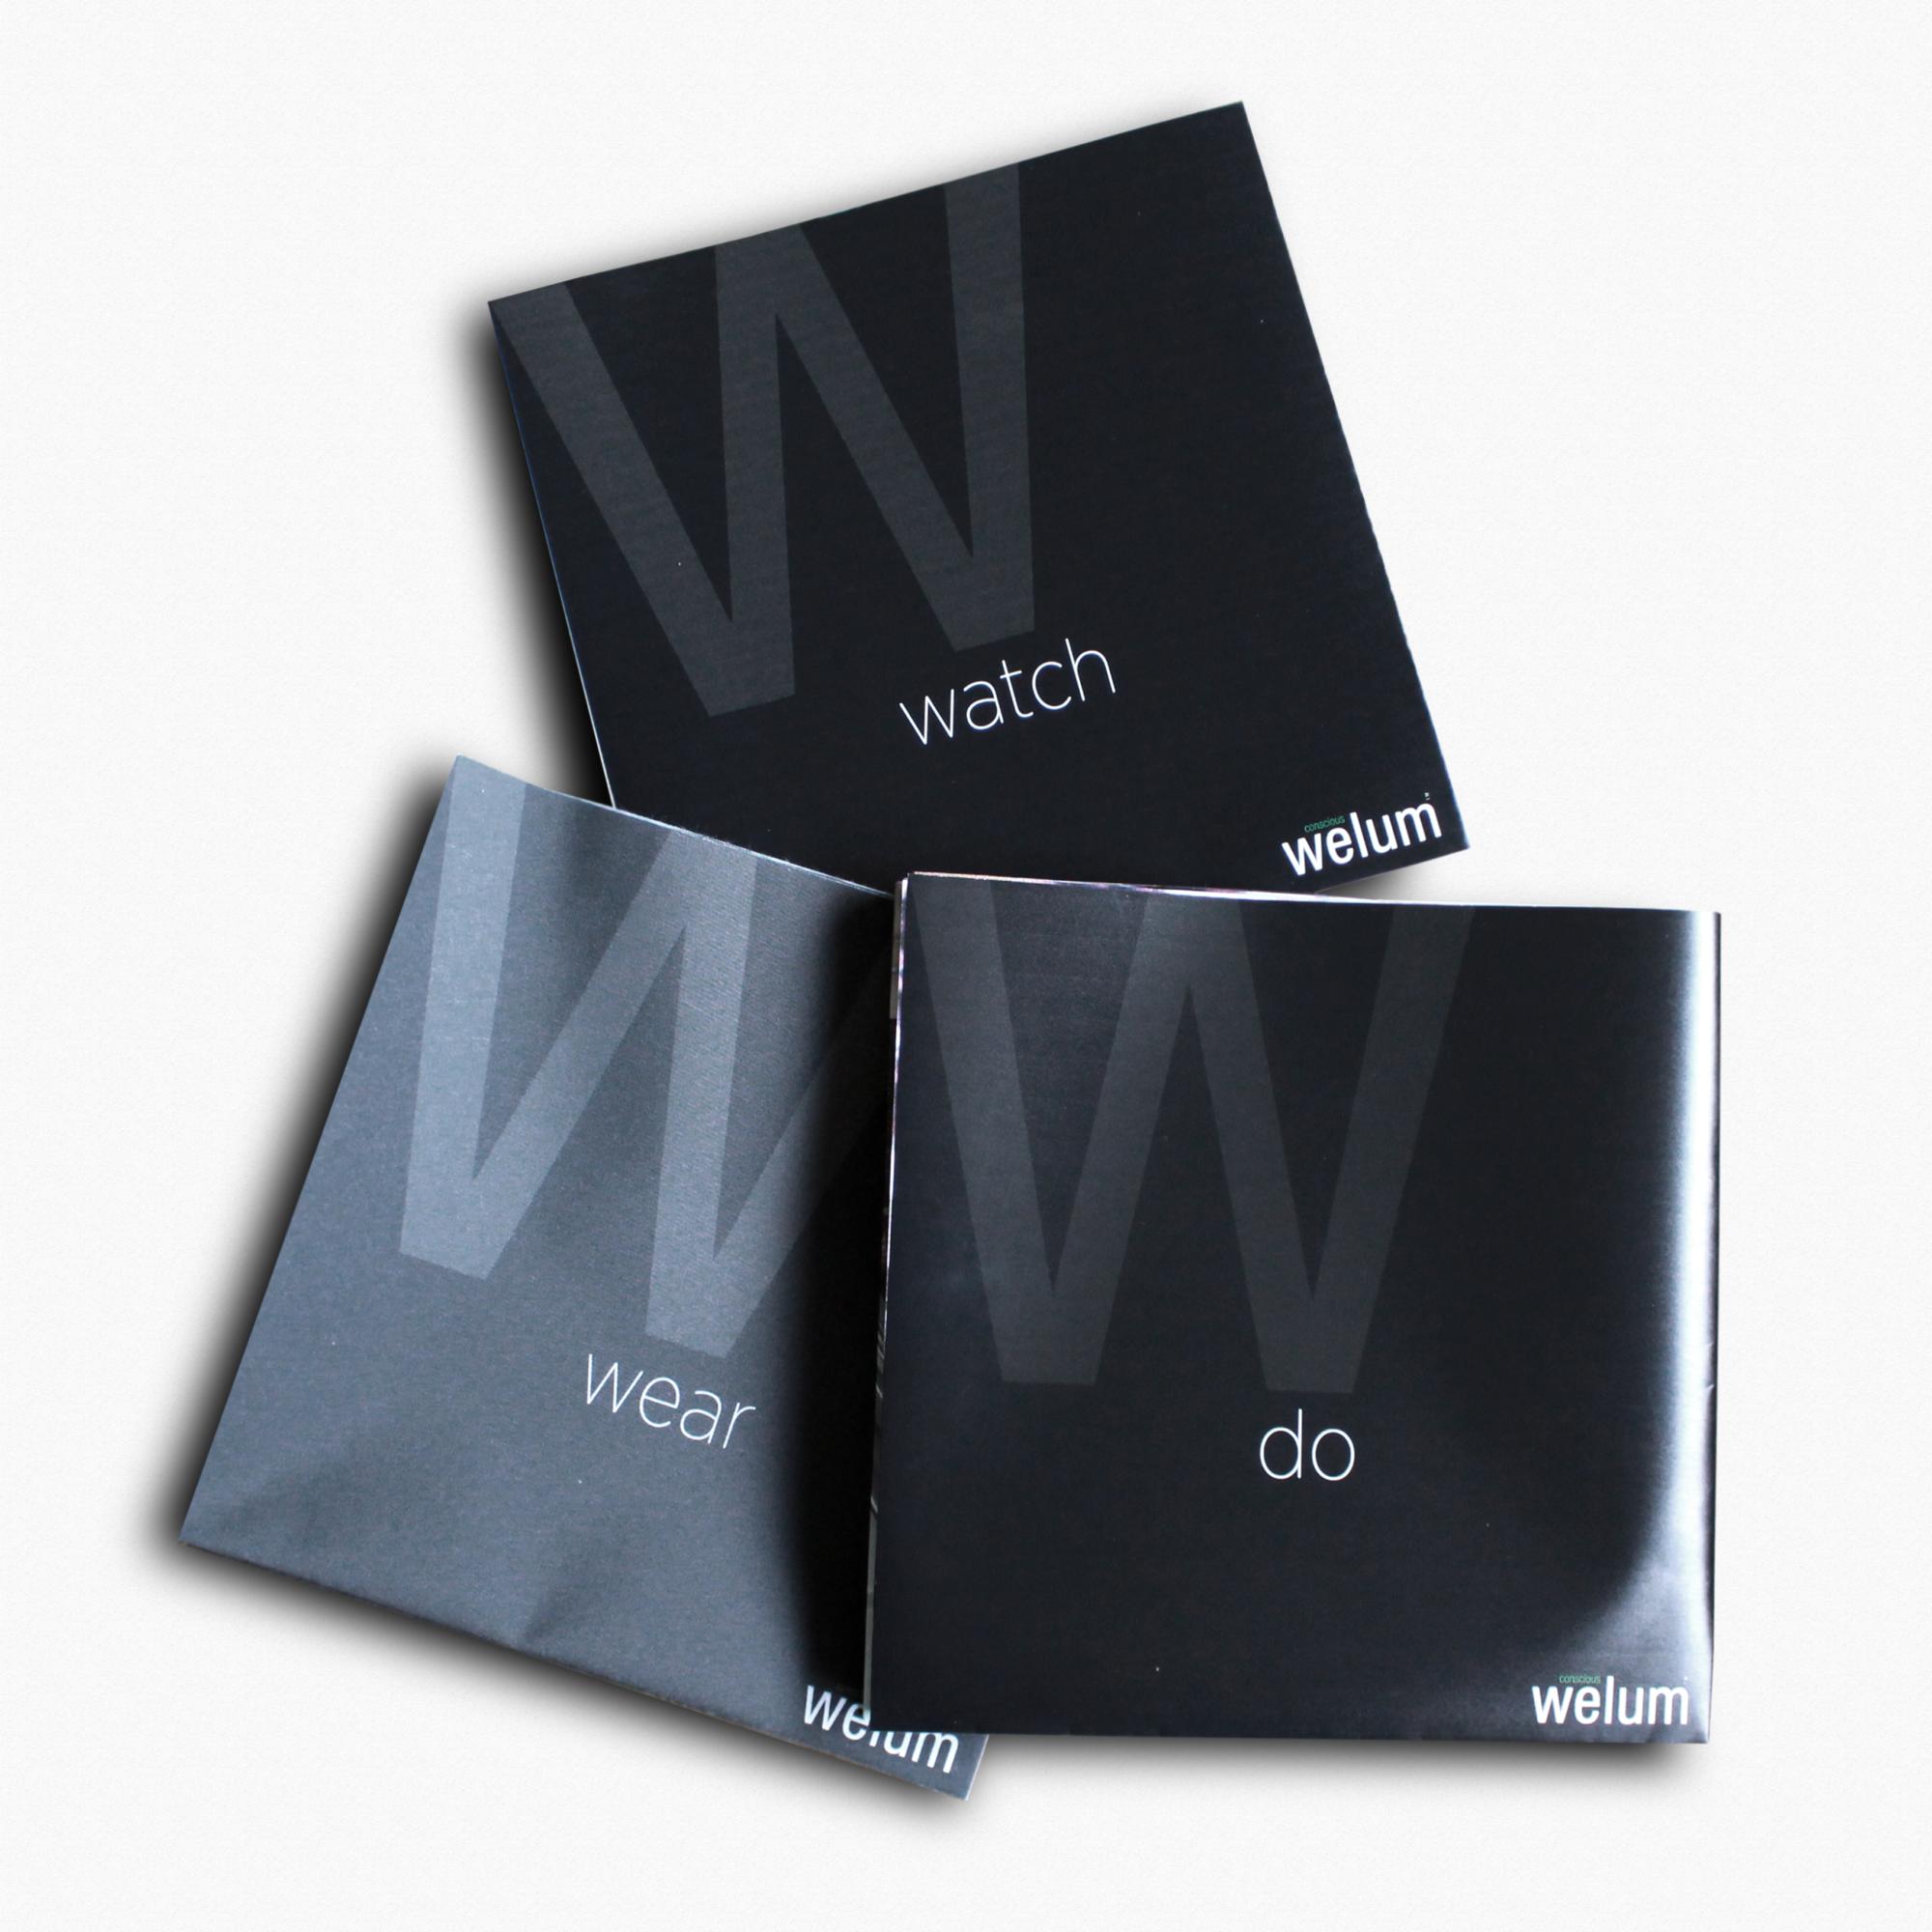 Welum-Bog2-Pressebilleder_02-1